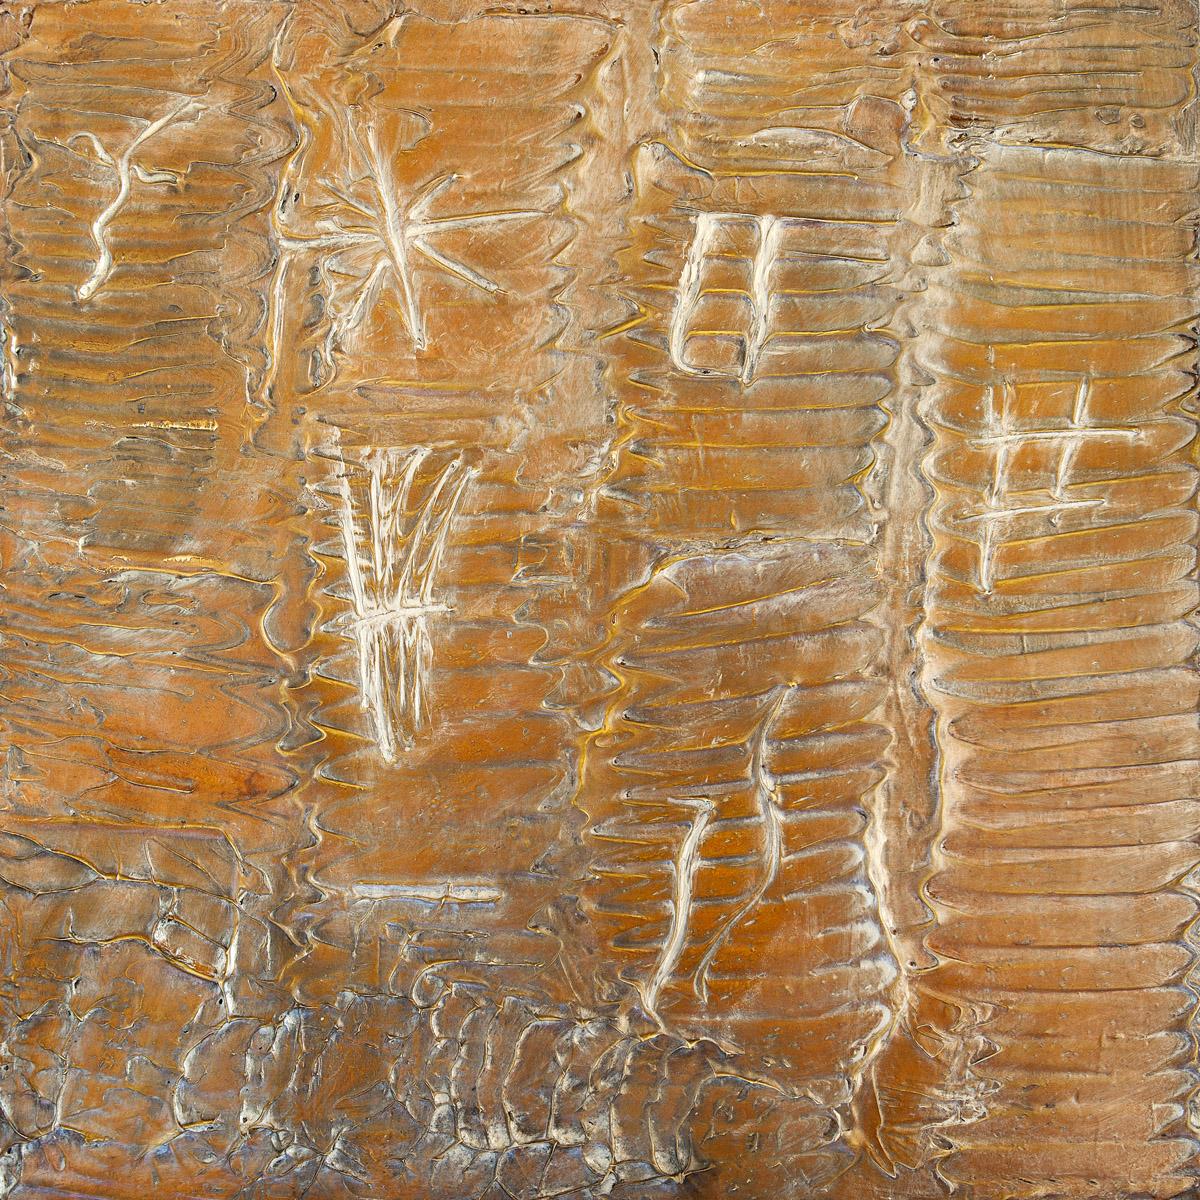 Ugarit,_óleo_sobre_madera,_40x40cm,_2016.jpg